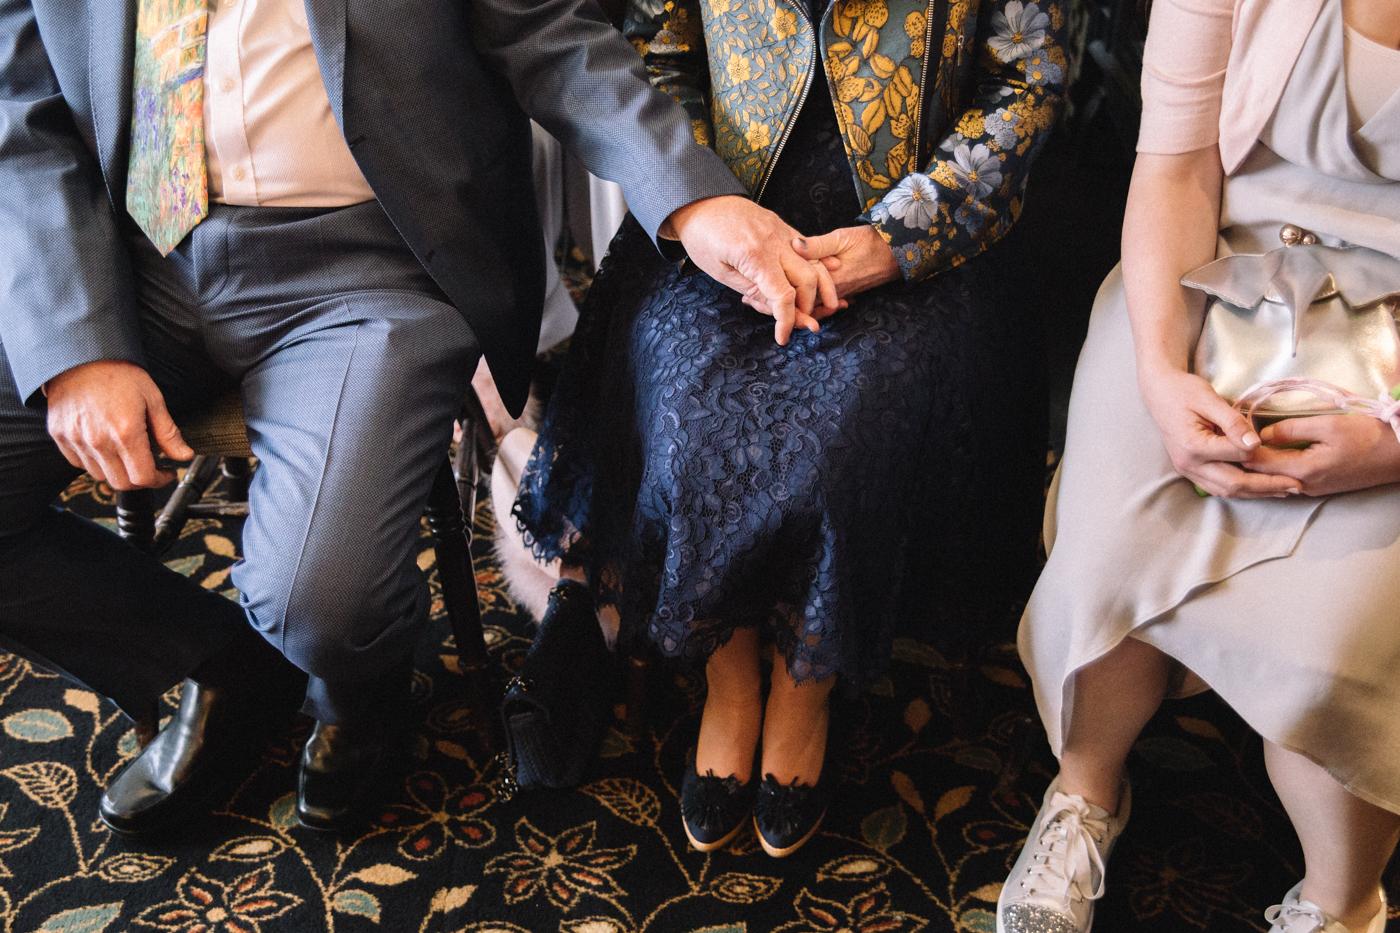 knights-templar-london-city-centre-wedding-photographer-charing-cross-creative-0023.jpg